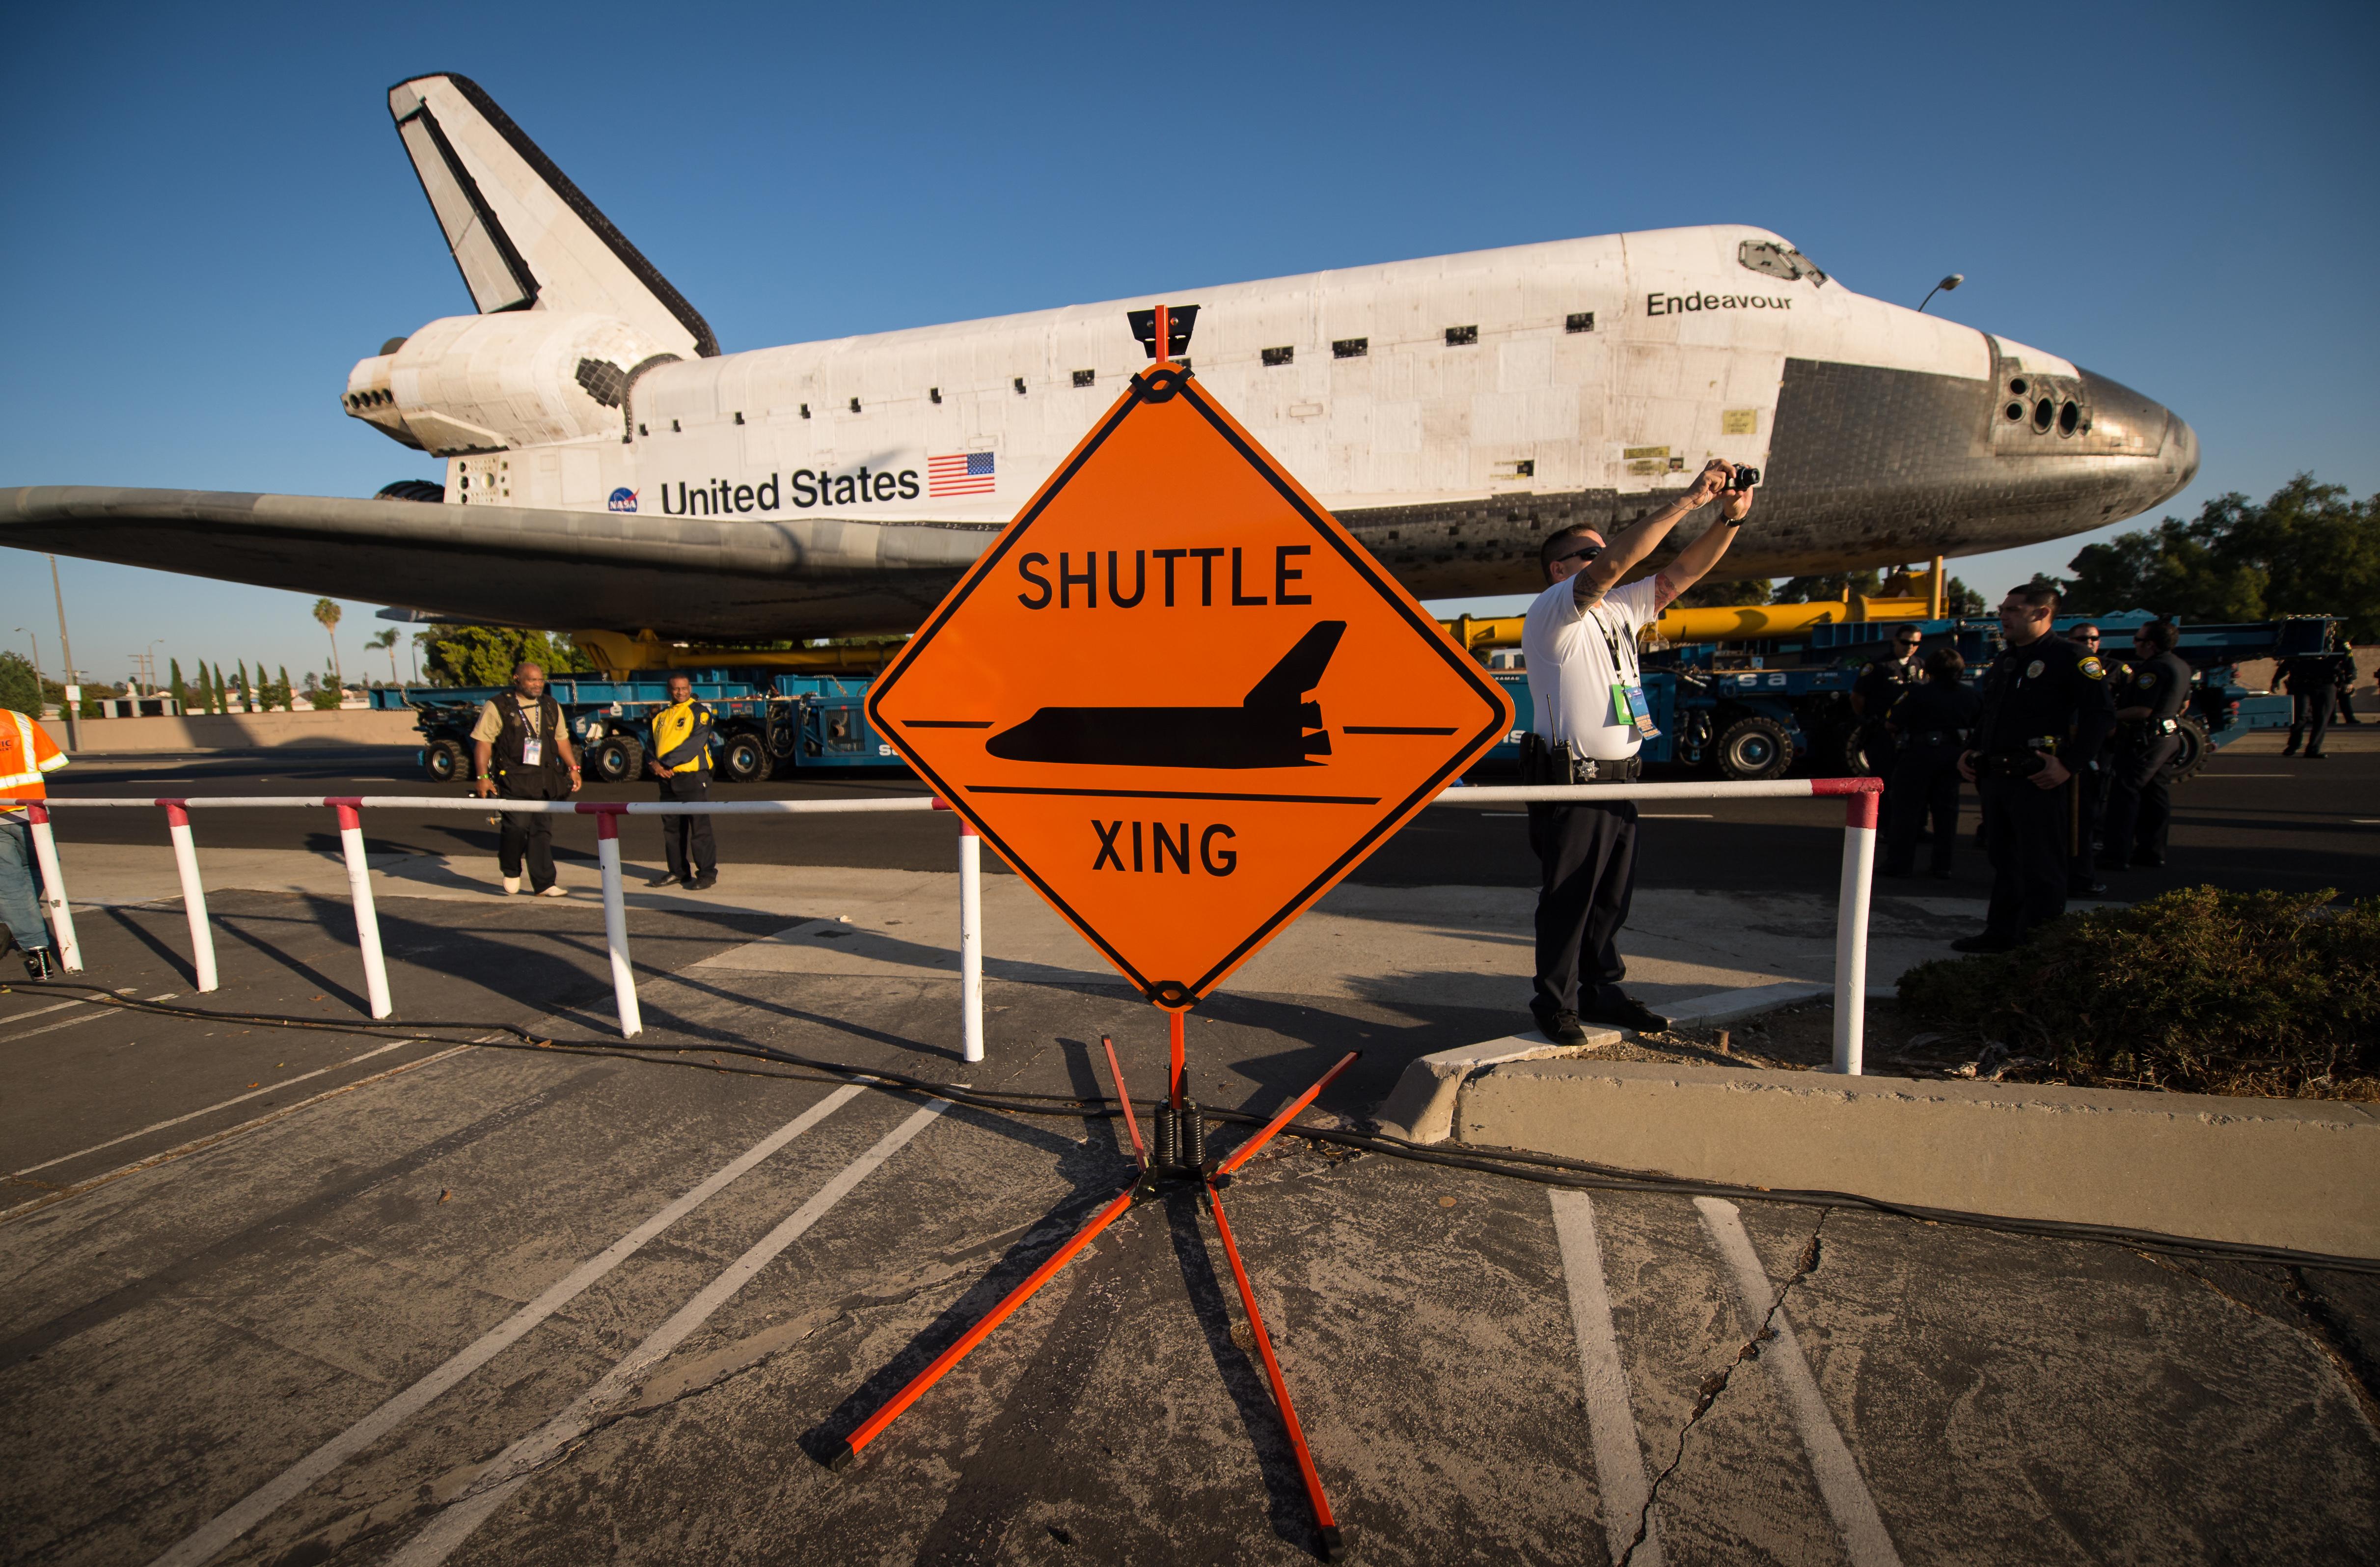 space shuttle endeavour size - photo #23